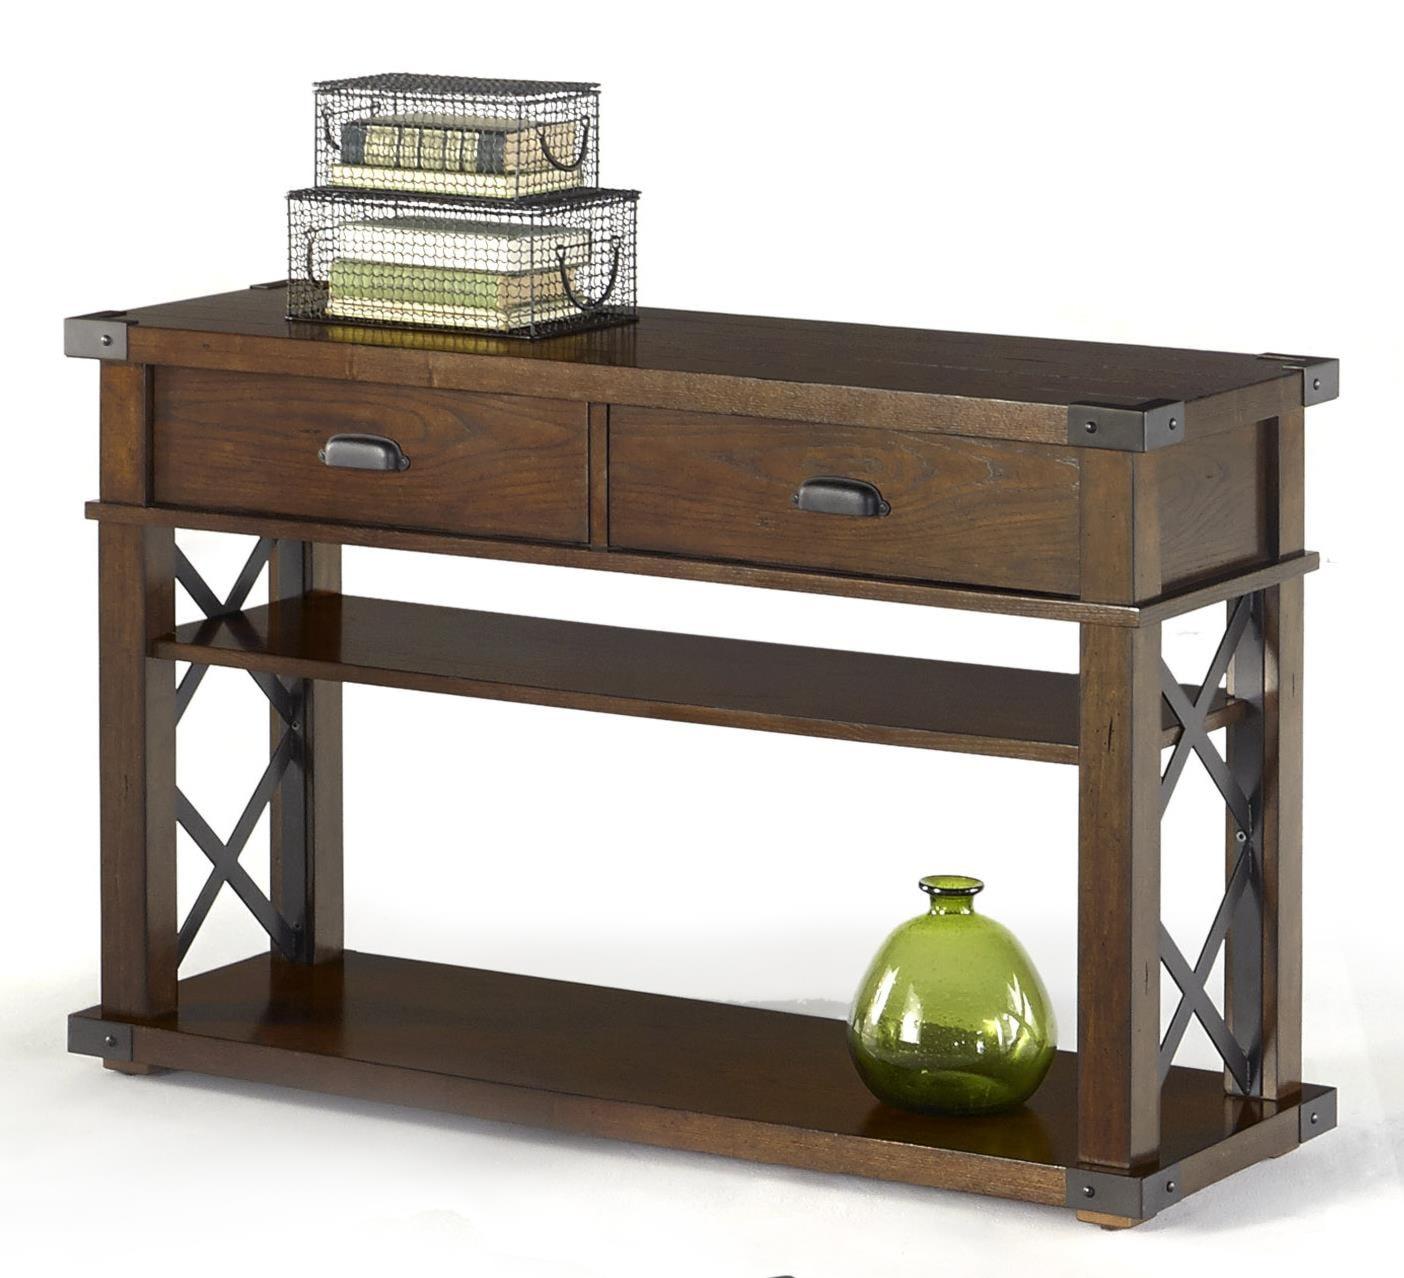 furniture motifs. Progressive Furniture Landmark Industrial Sofa/Console Table With X-Shaped  Metal Motifs Furniture Motifs O